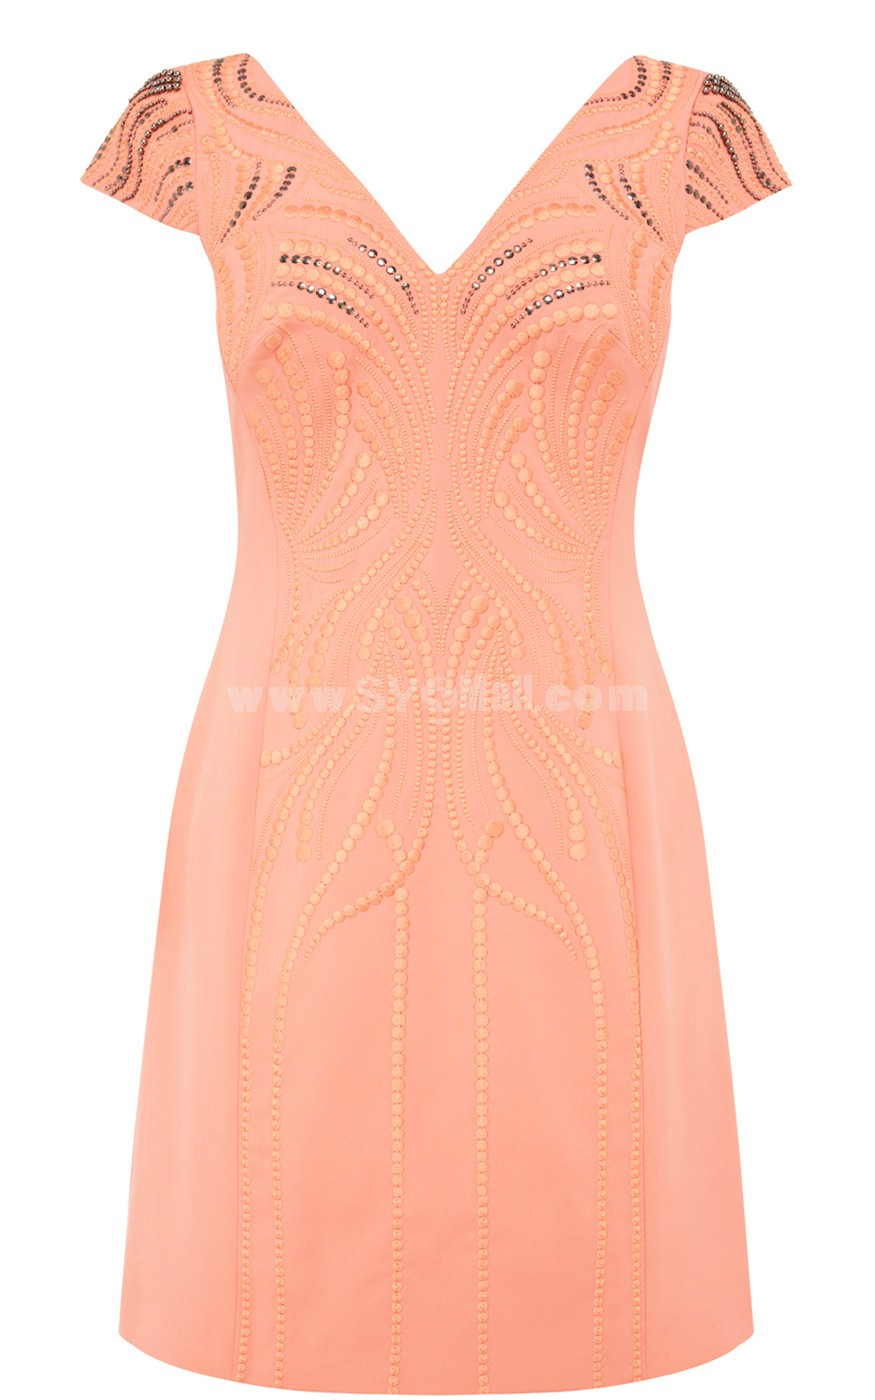 COAST New Arrival Pink Beads Decoration Lady Dress Evening Dress DQ102